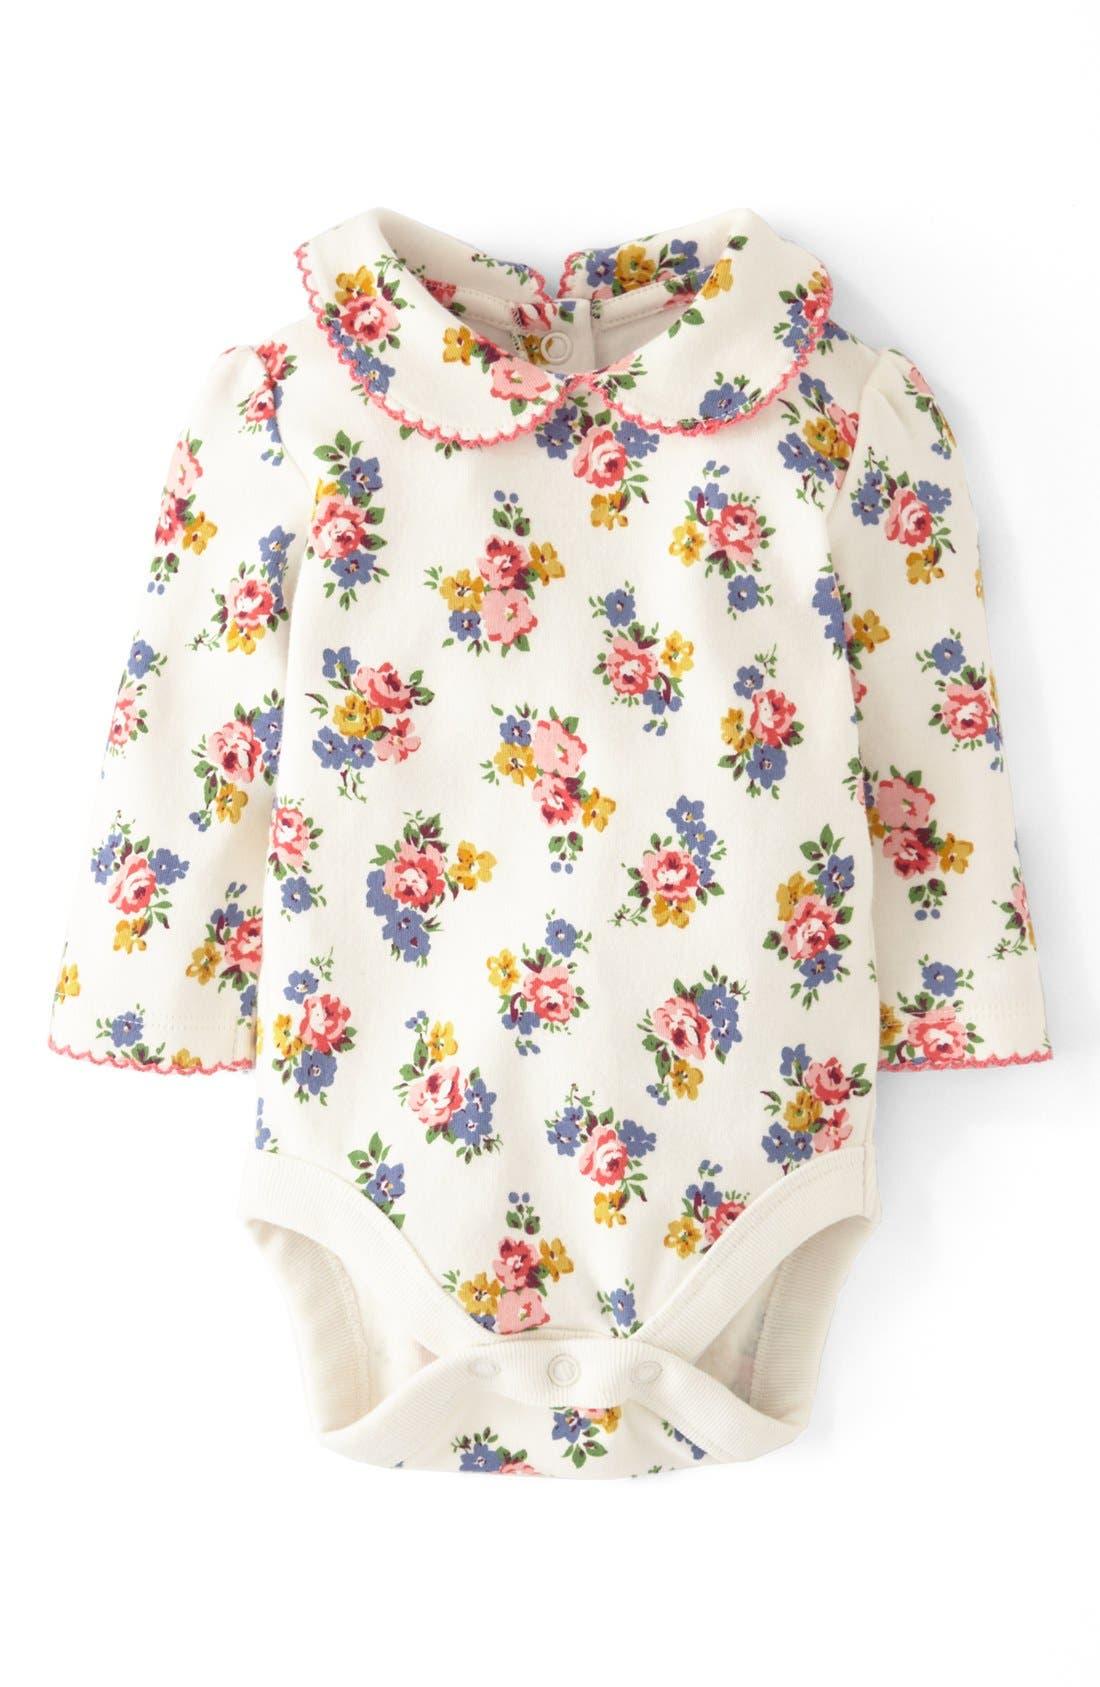 Alternate Image 1 Selected - Mini Boden 'Pretty Collar' Bodysuit (Baby Girls)